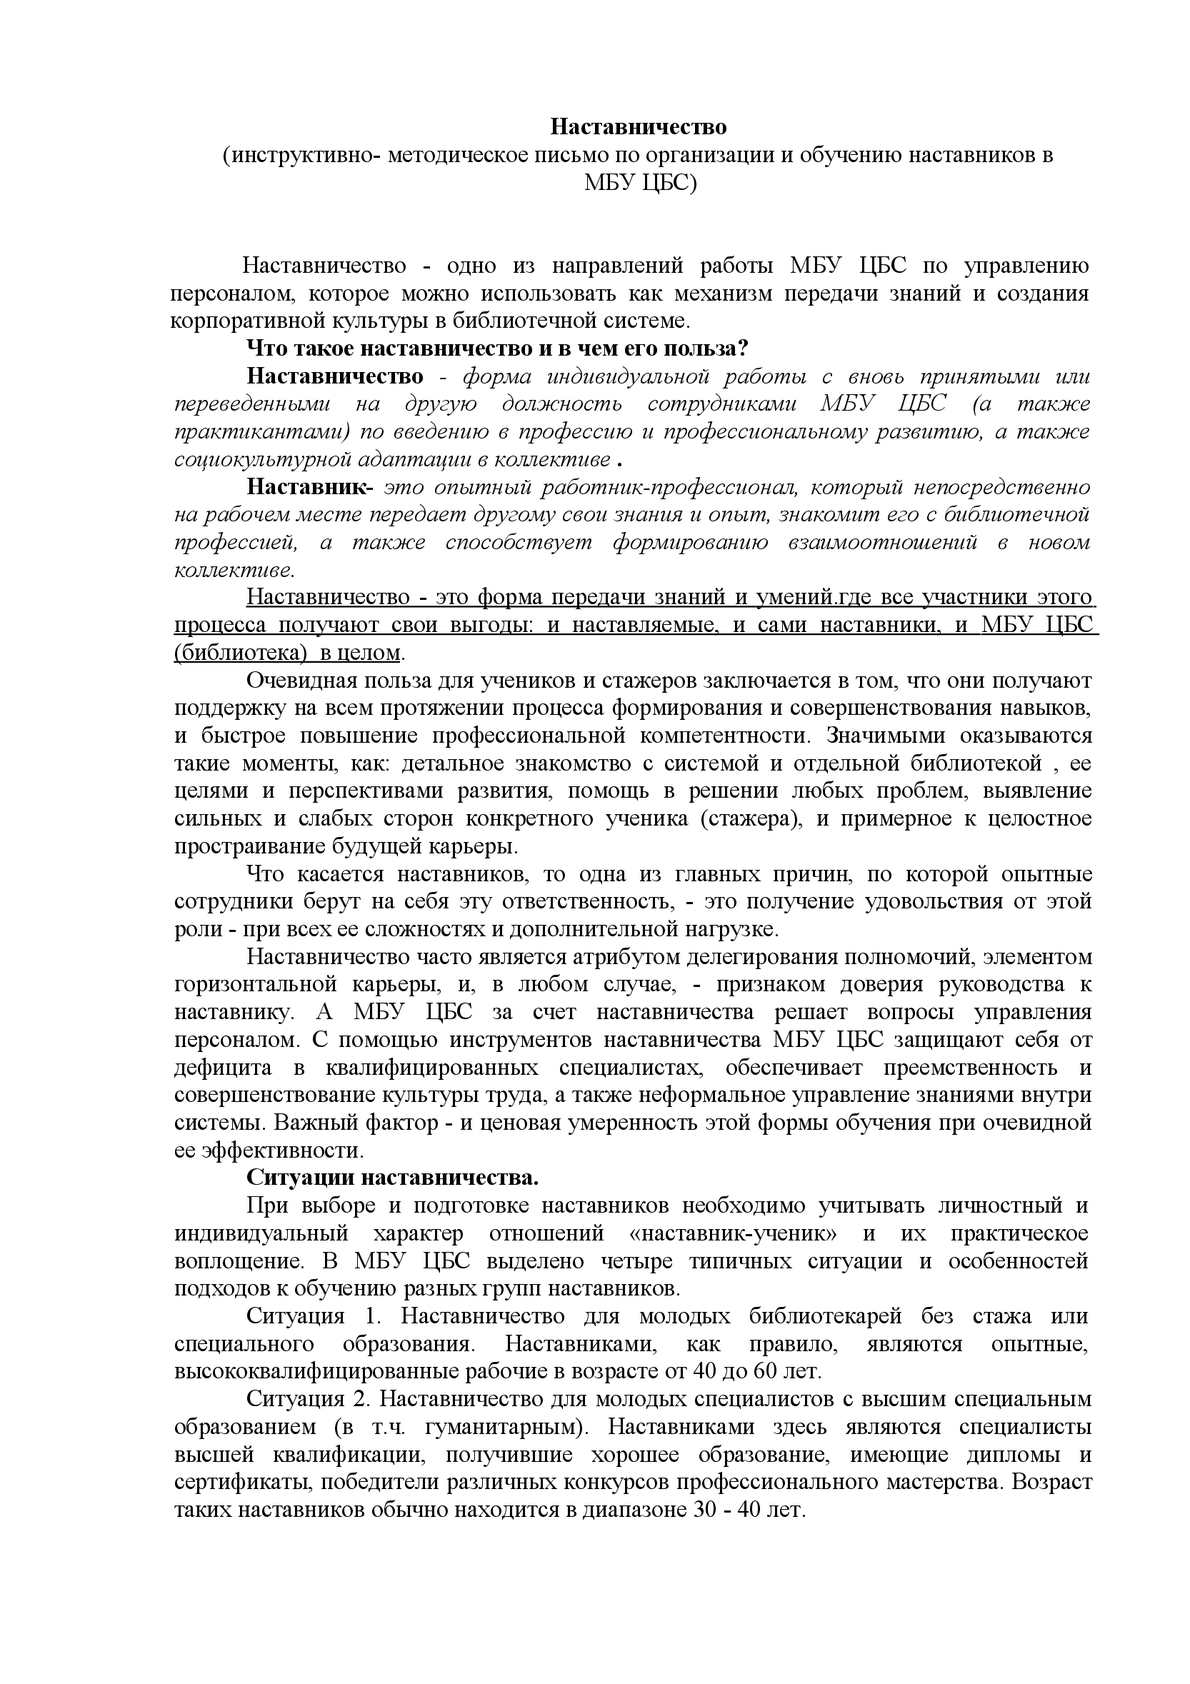 Calaméo   Наставничество инст. метод.письмо